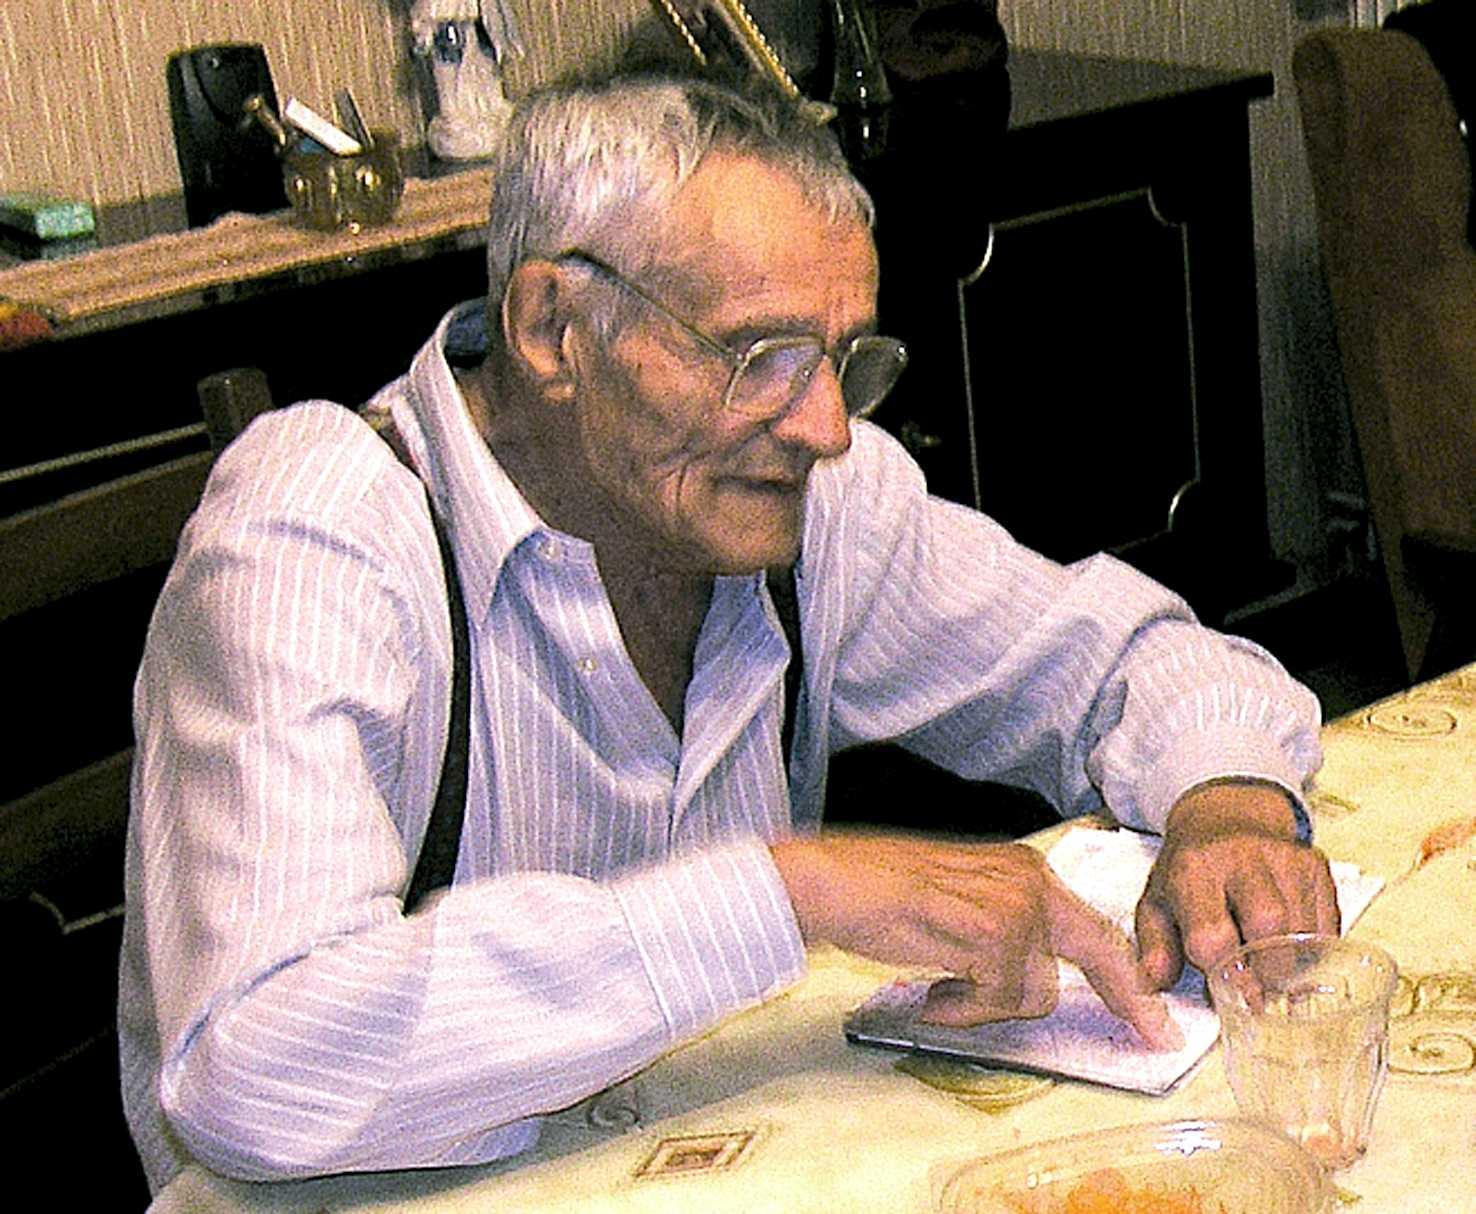 Antonio Moreno Ronchas